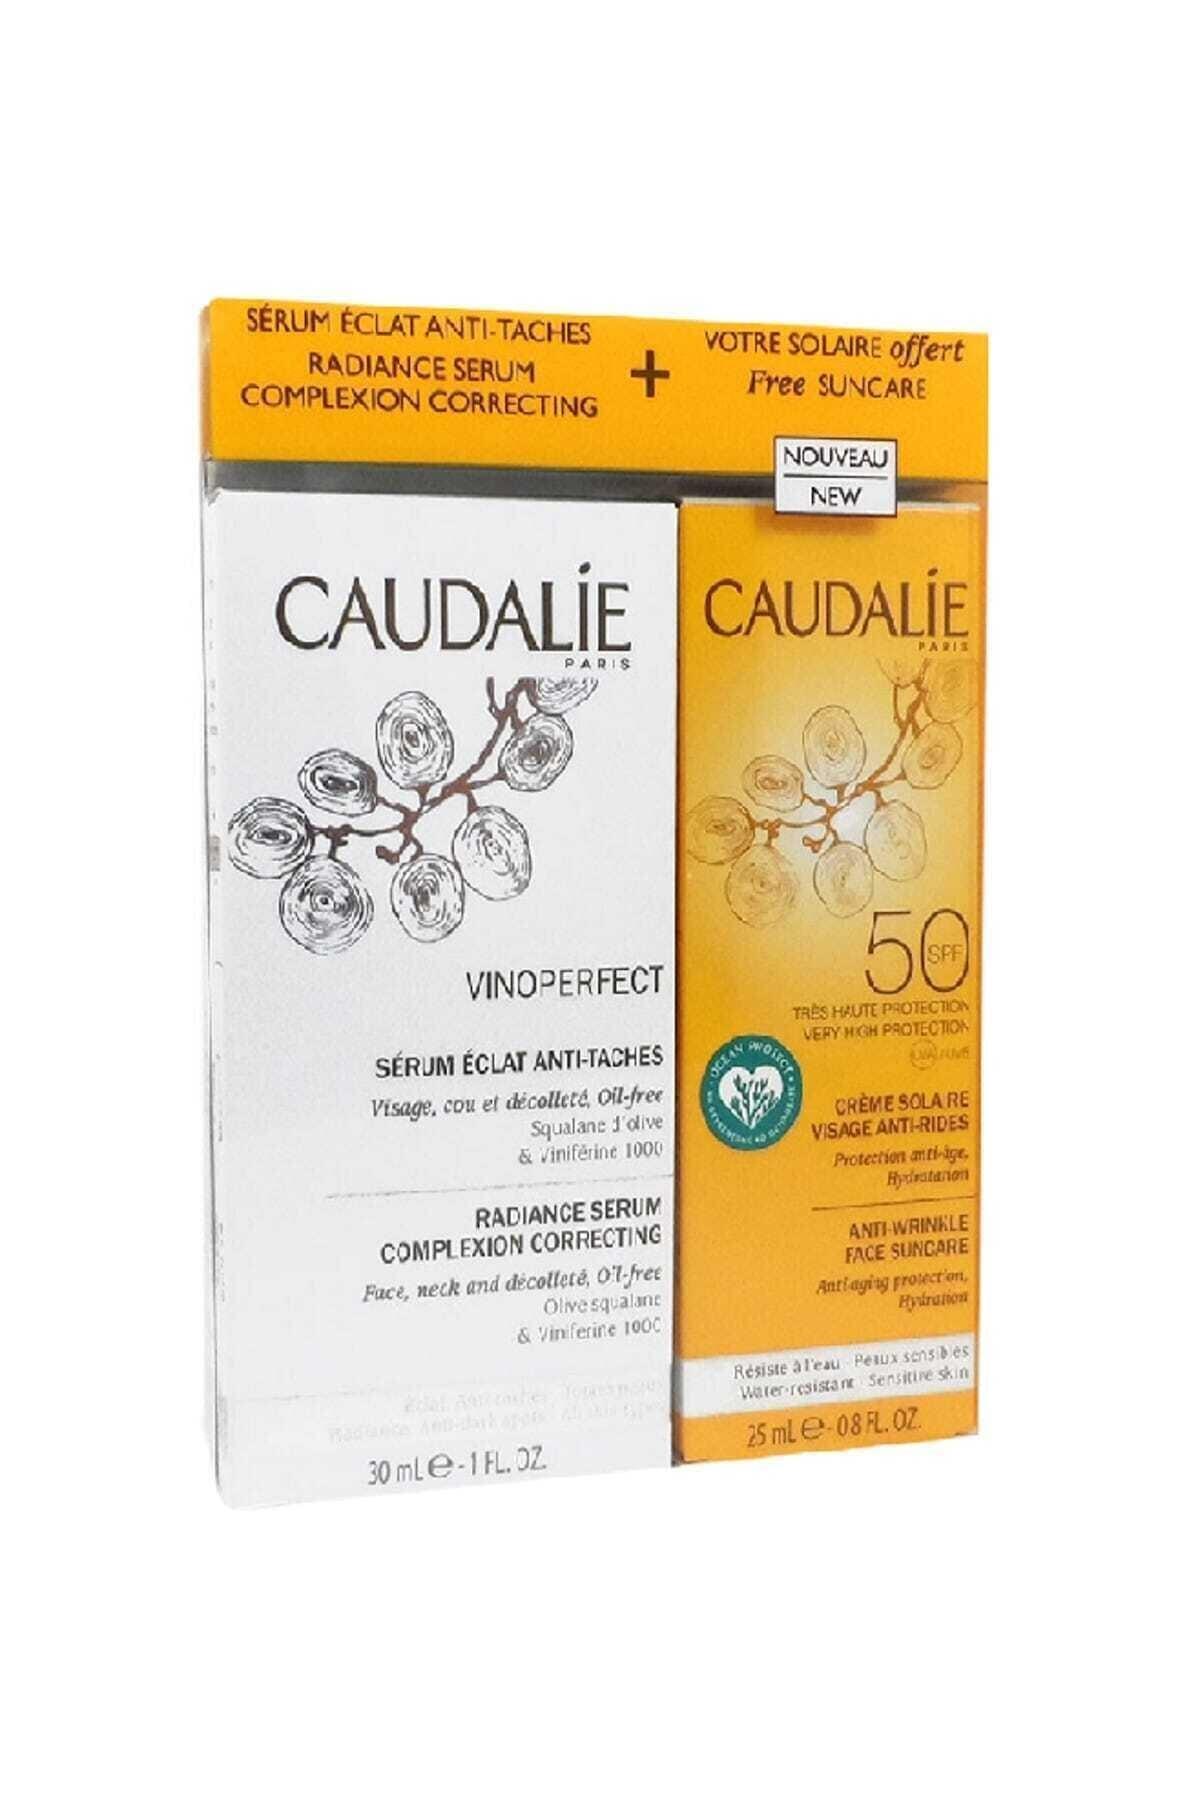 Caudalie Vinoperfect Radiance Serum 30 ml + Kırışıklık Karşıtı Güneş Kremi 25 ml 1